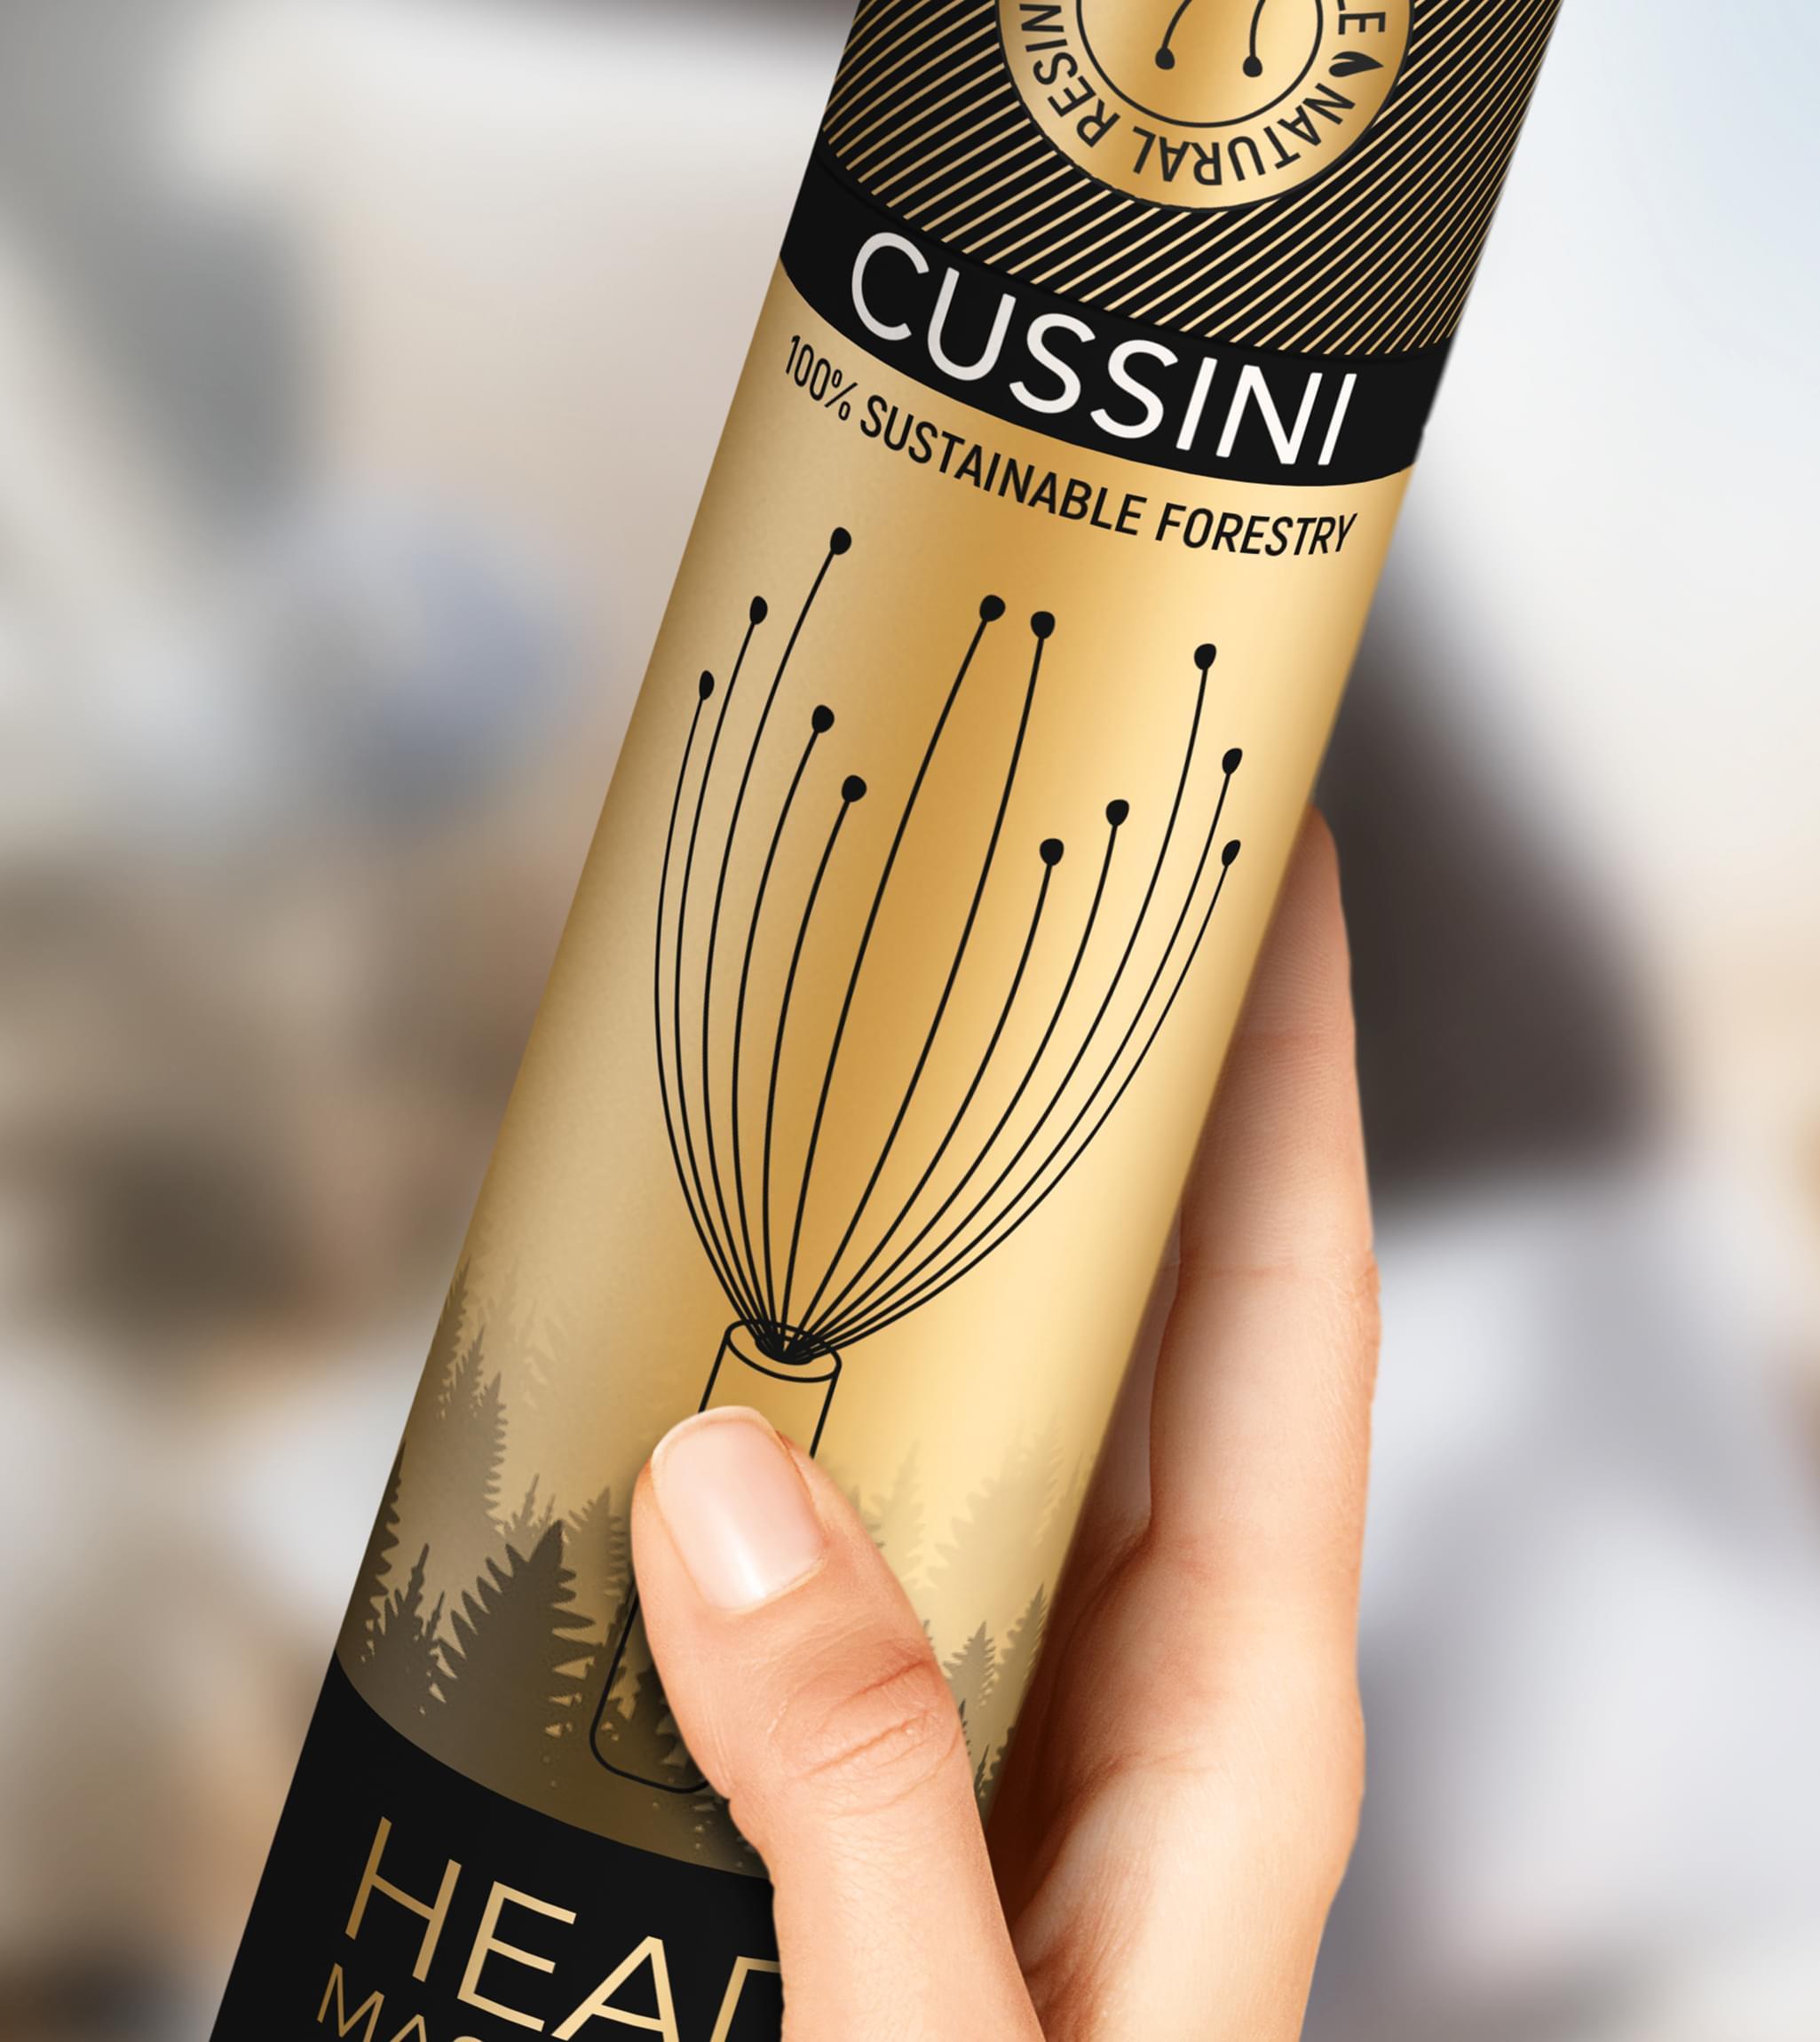 CUSSINI Packaging